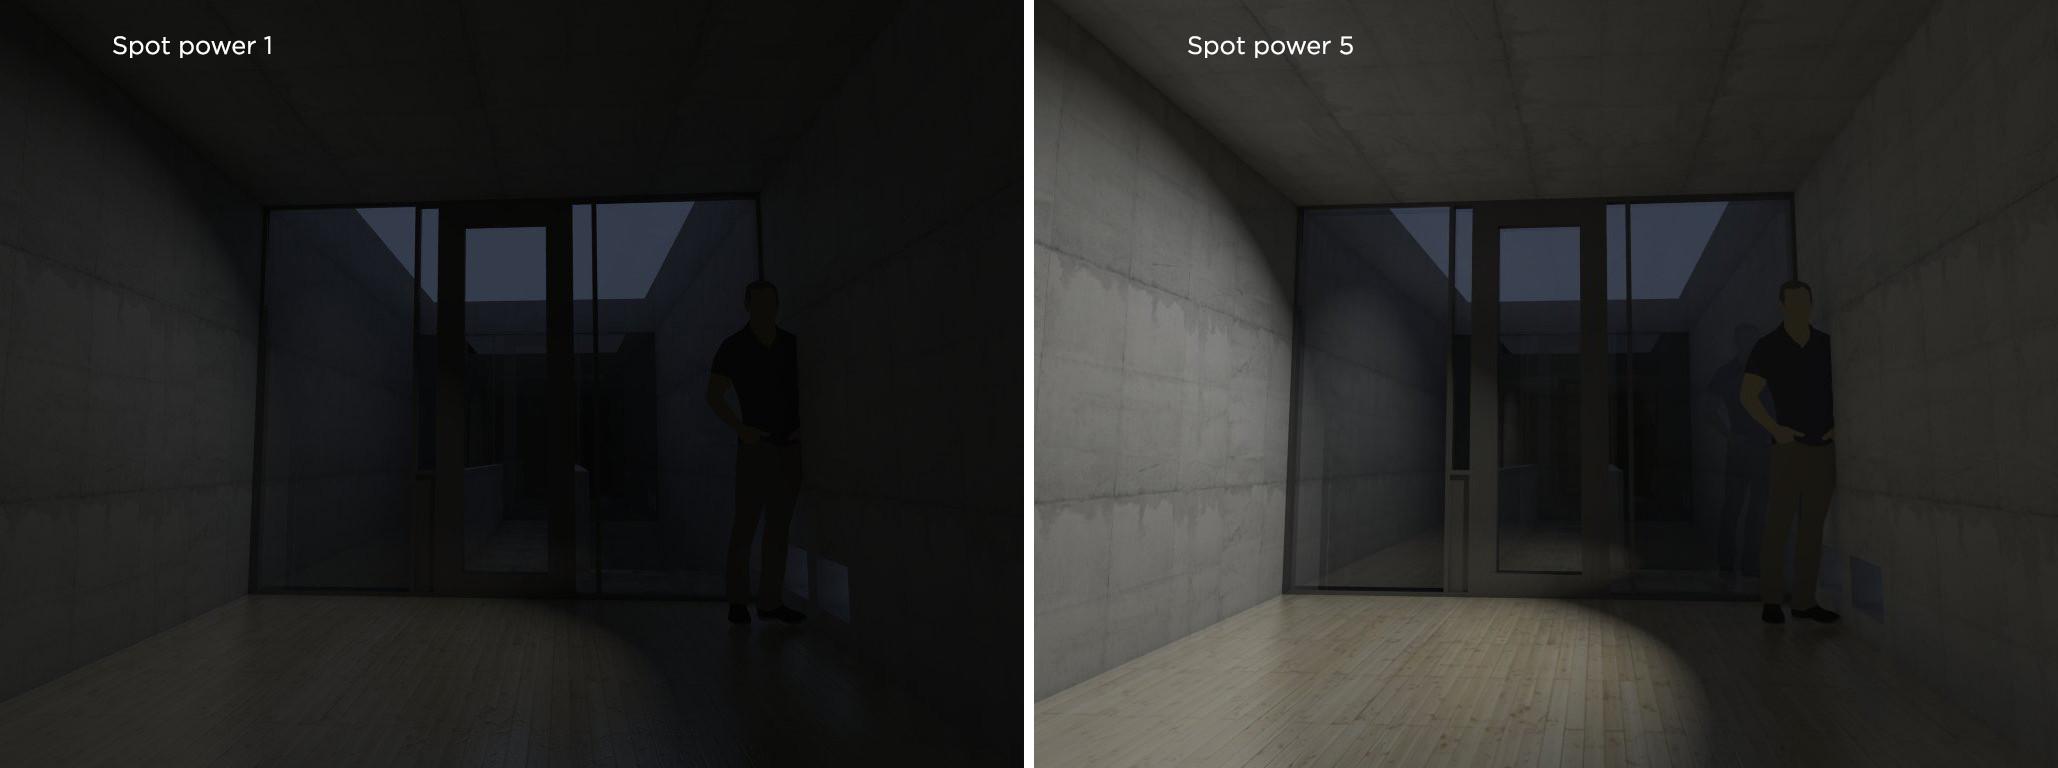 spotpower-comparison.jpg